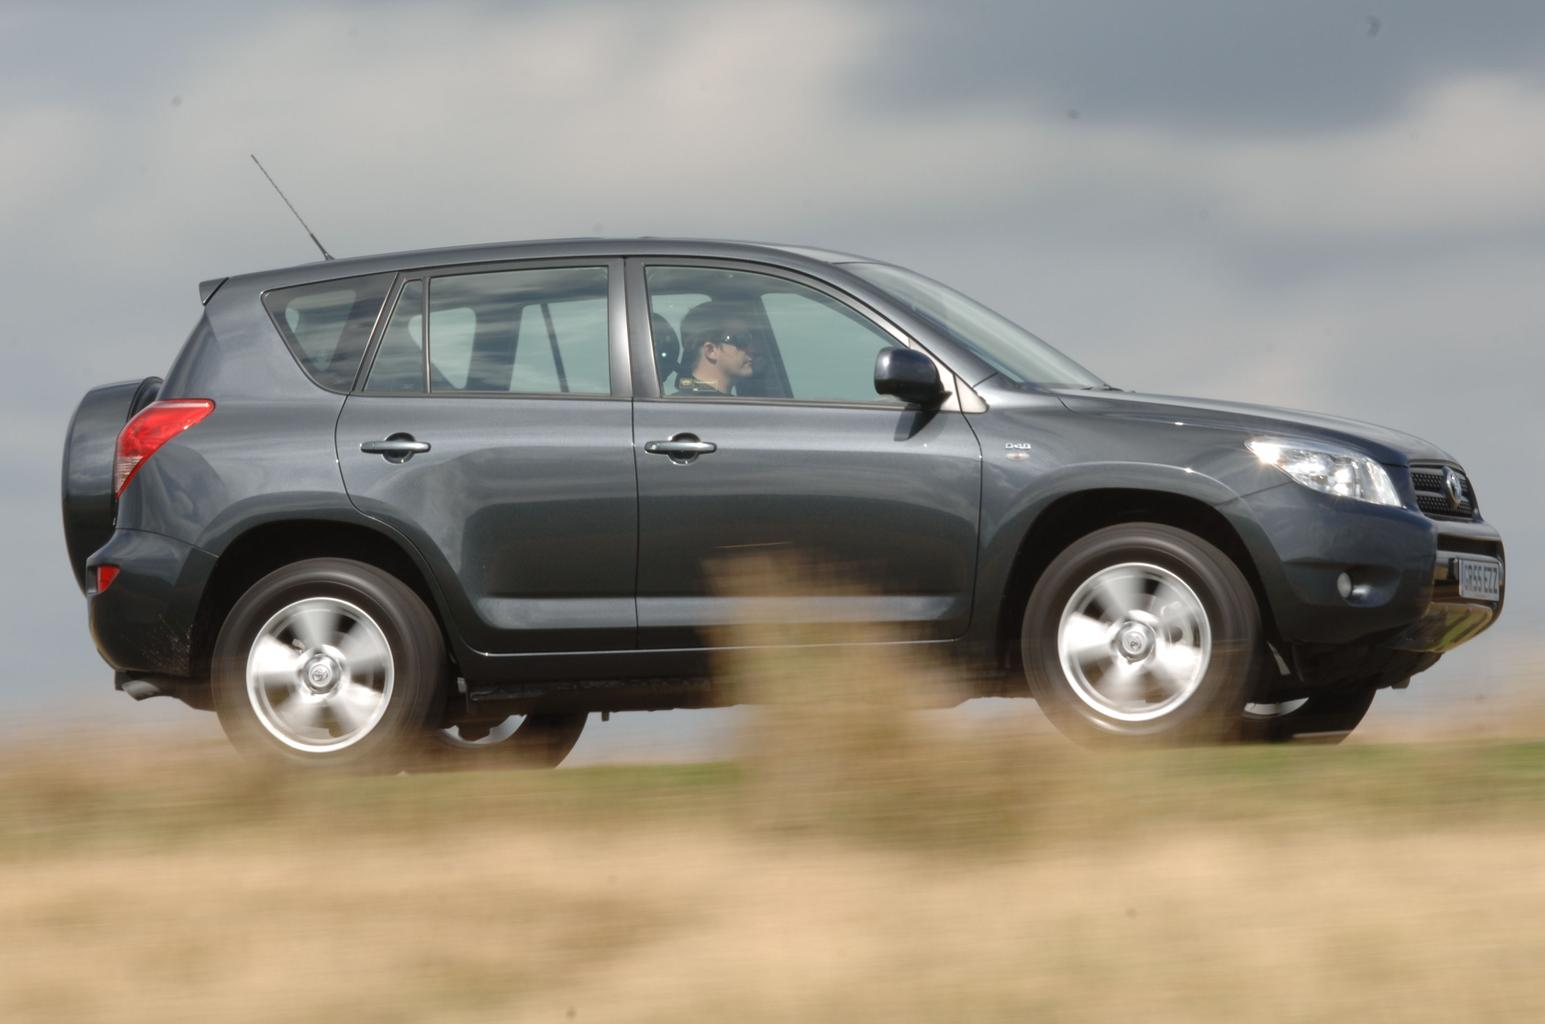 Used test – affordable SUVs: Hyundai Santa Fe vs Land Rover Freelander and rivals